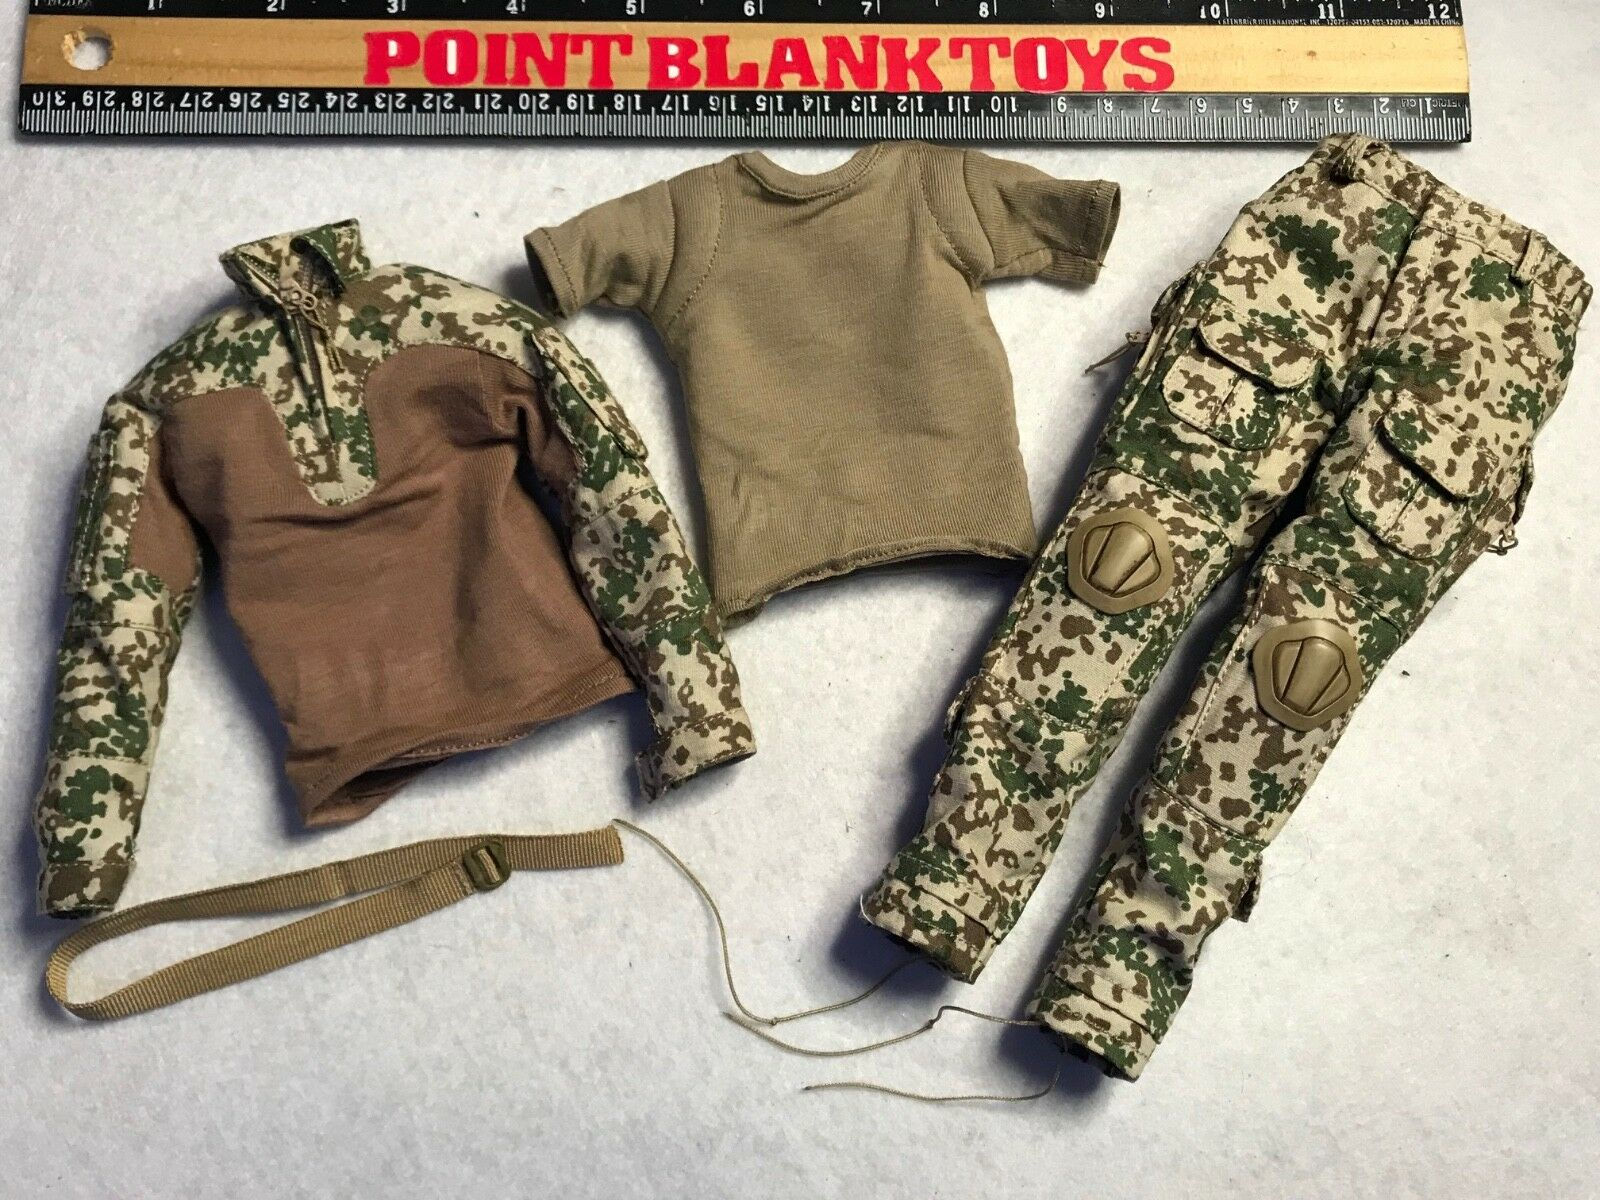 SOLDIER SOLDIER SOLDIER STORY Uniform KSM KOMMANDO SPEZIALKR MARINE 1 6 ACTION FIGURE TOYS dam 53a53f